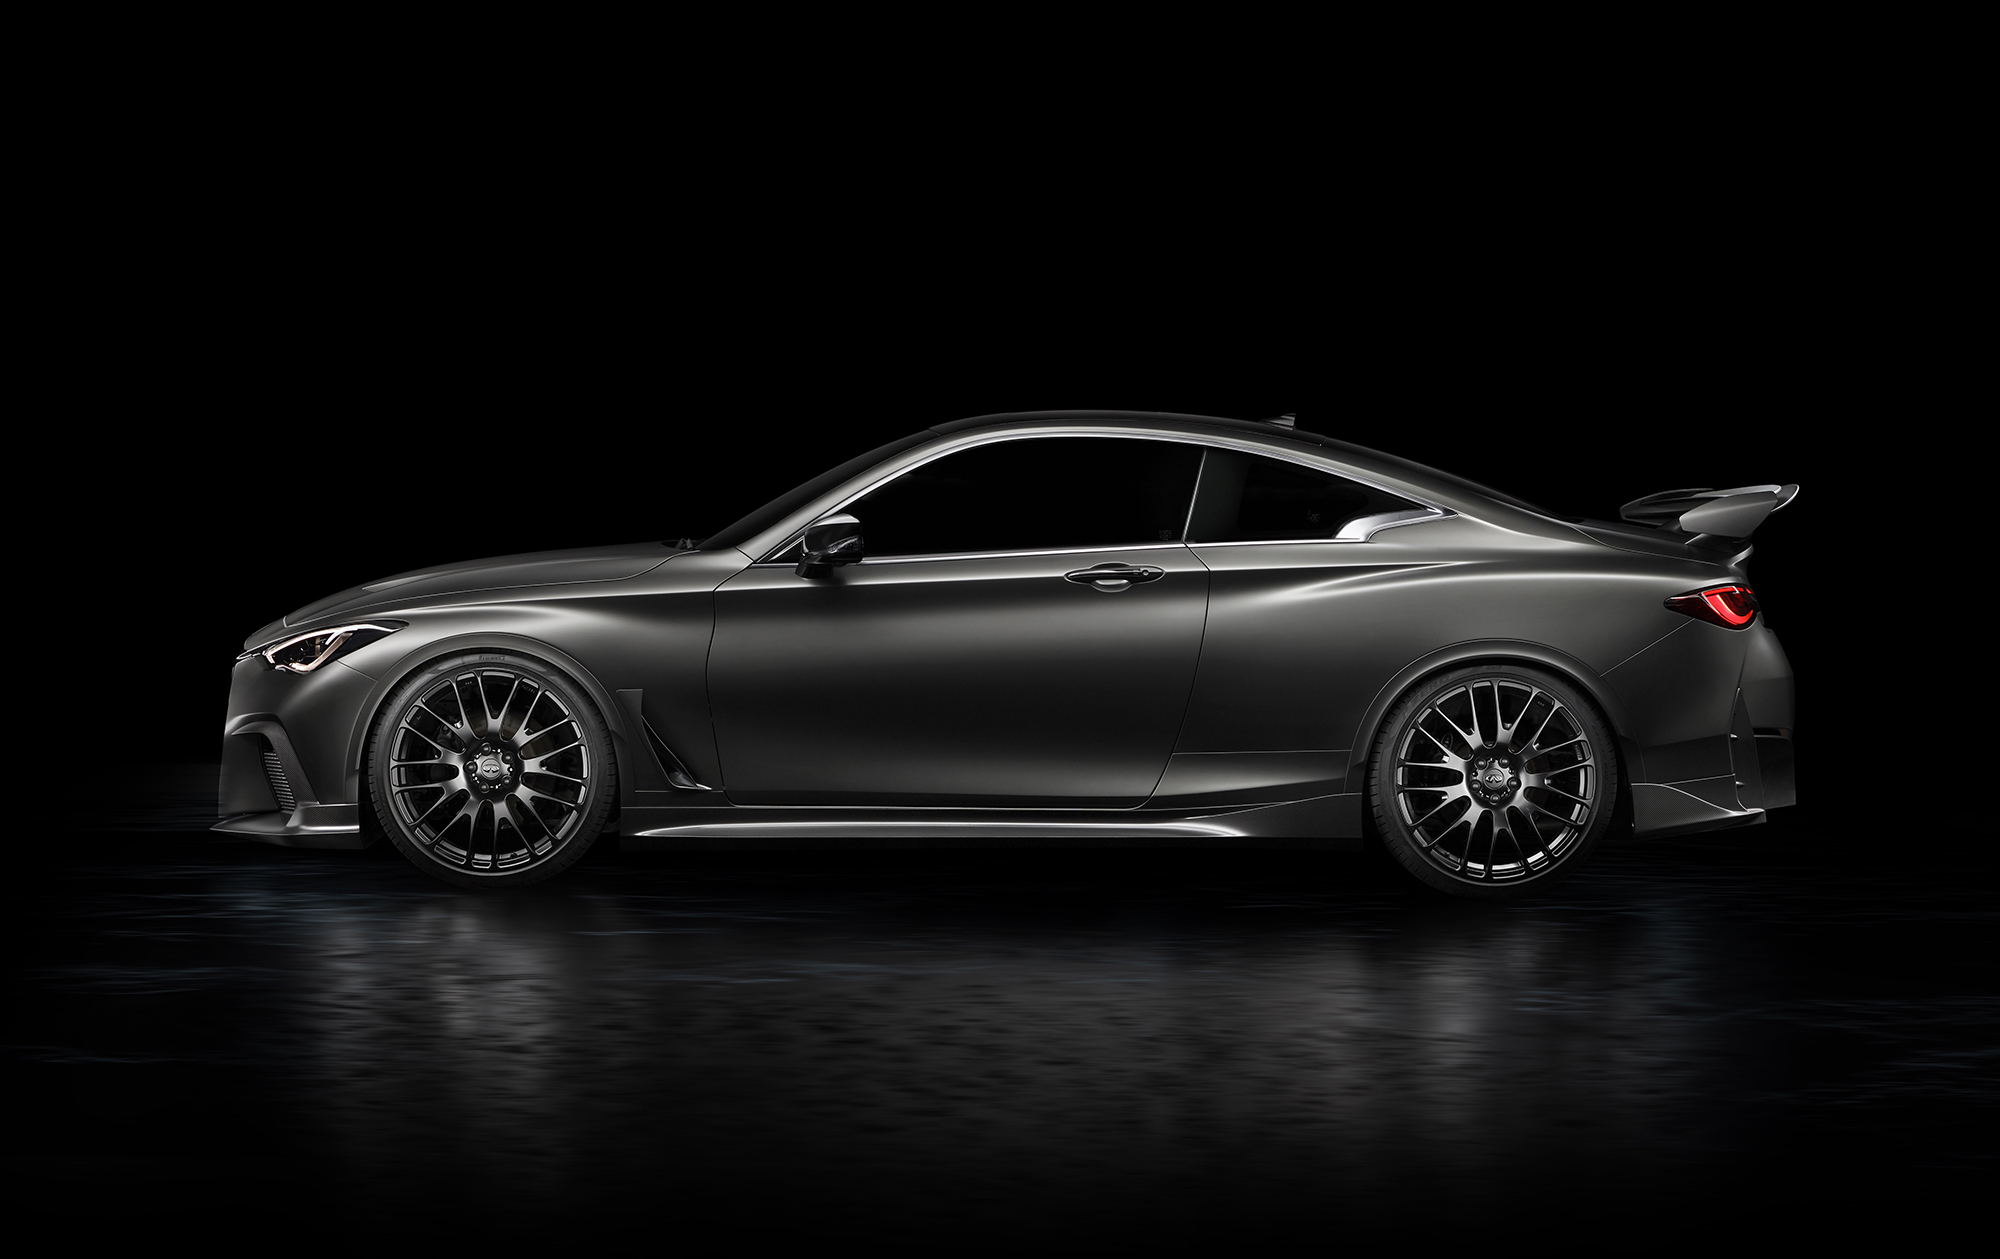 Automotive Photography Studio Car Studio Hire